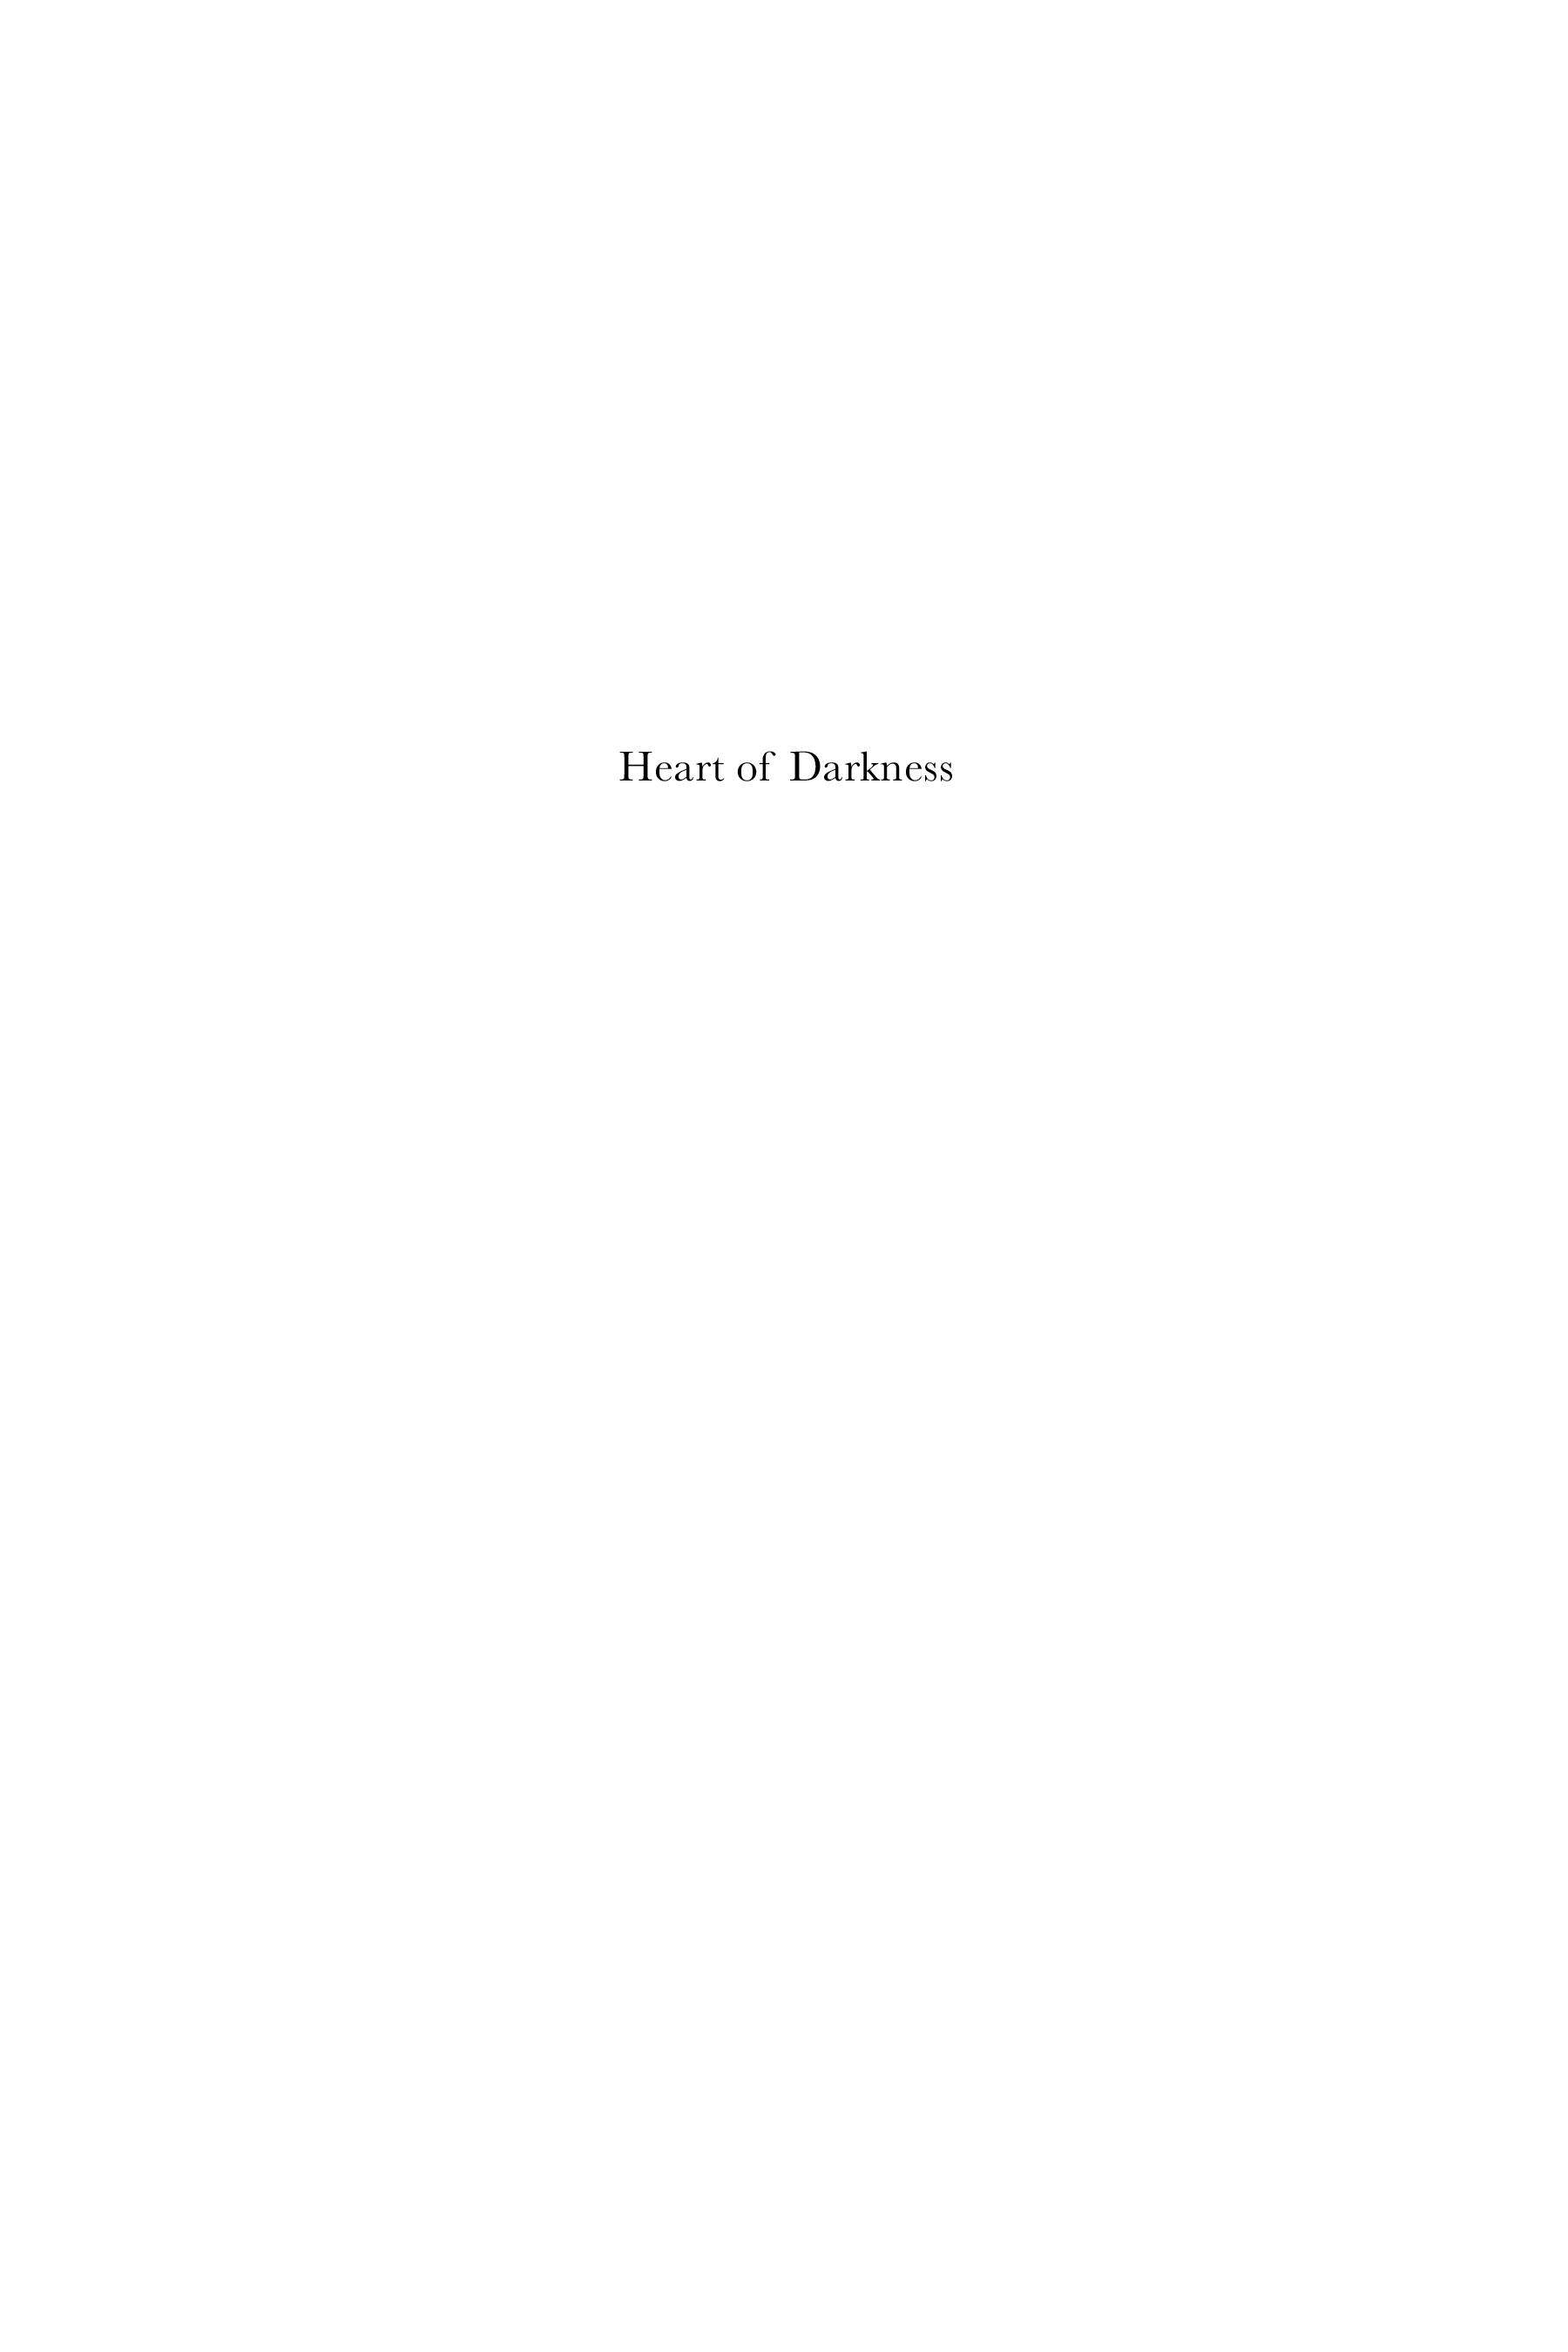 Heart of Darkness (spread 1)